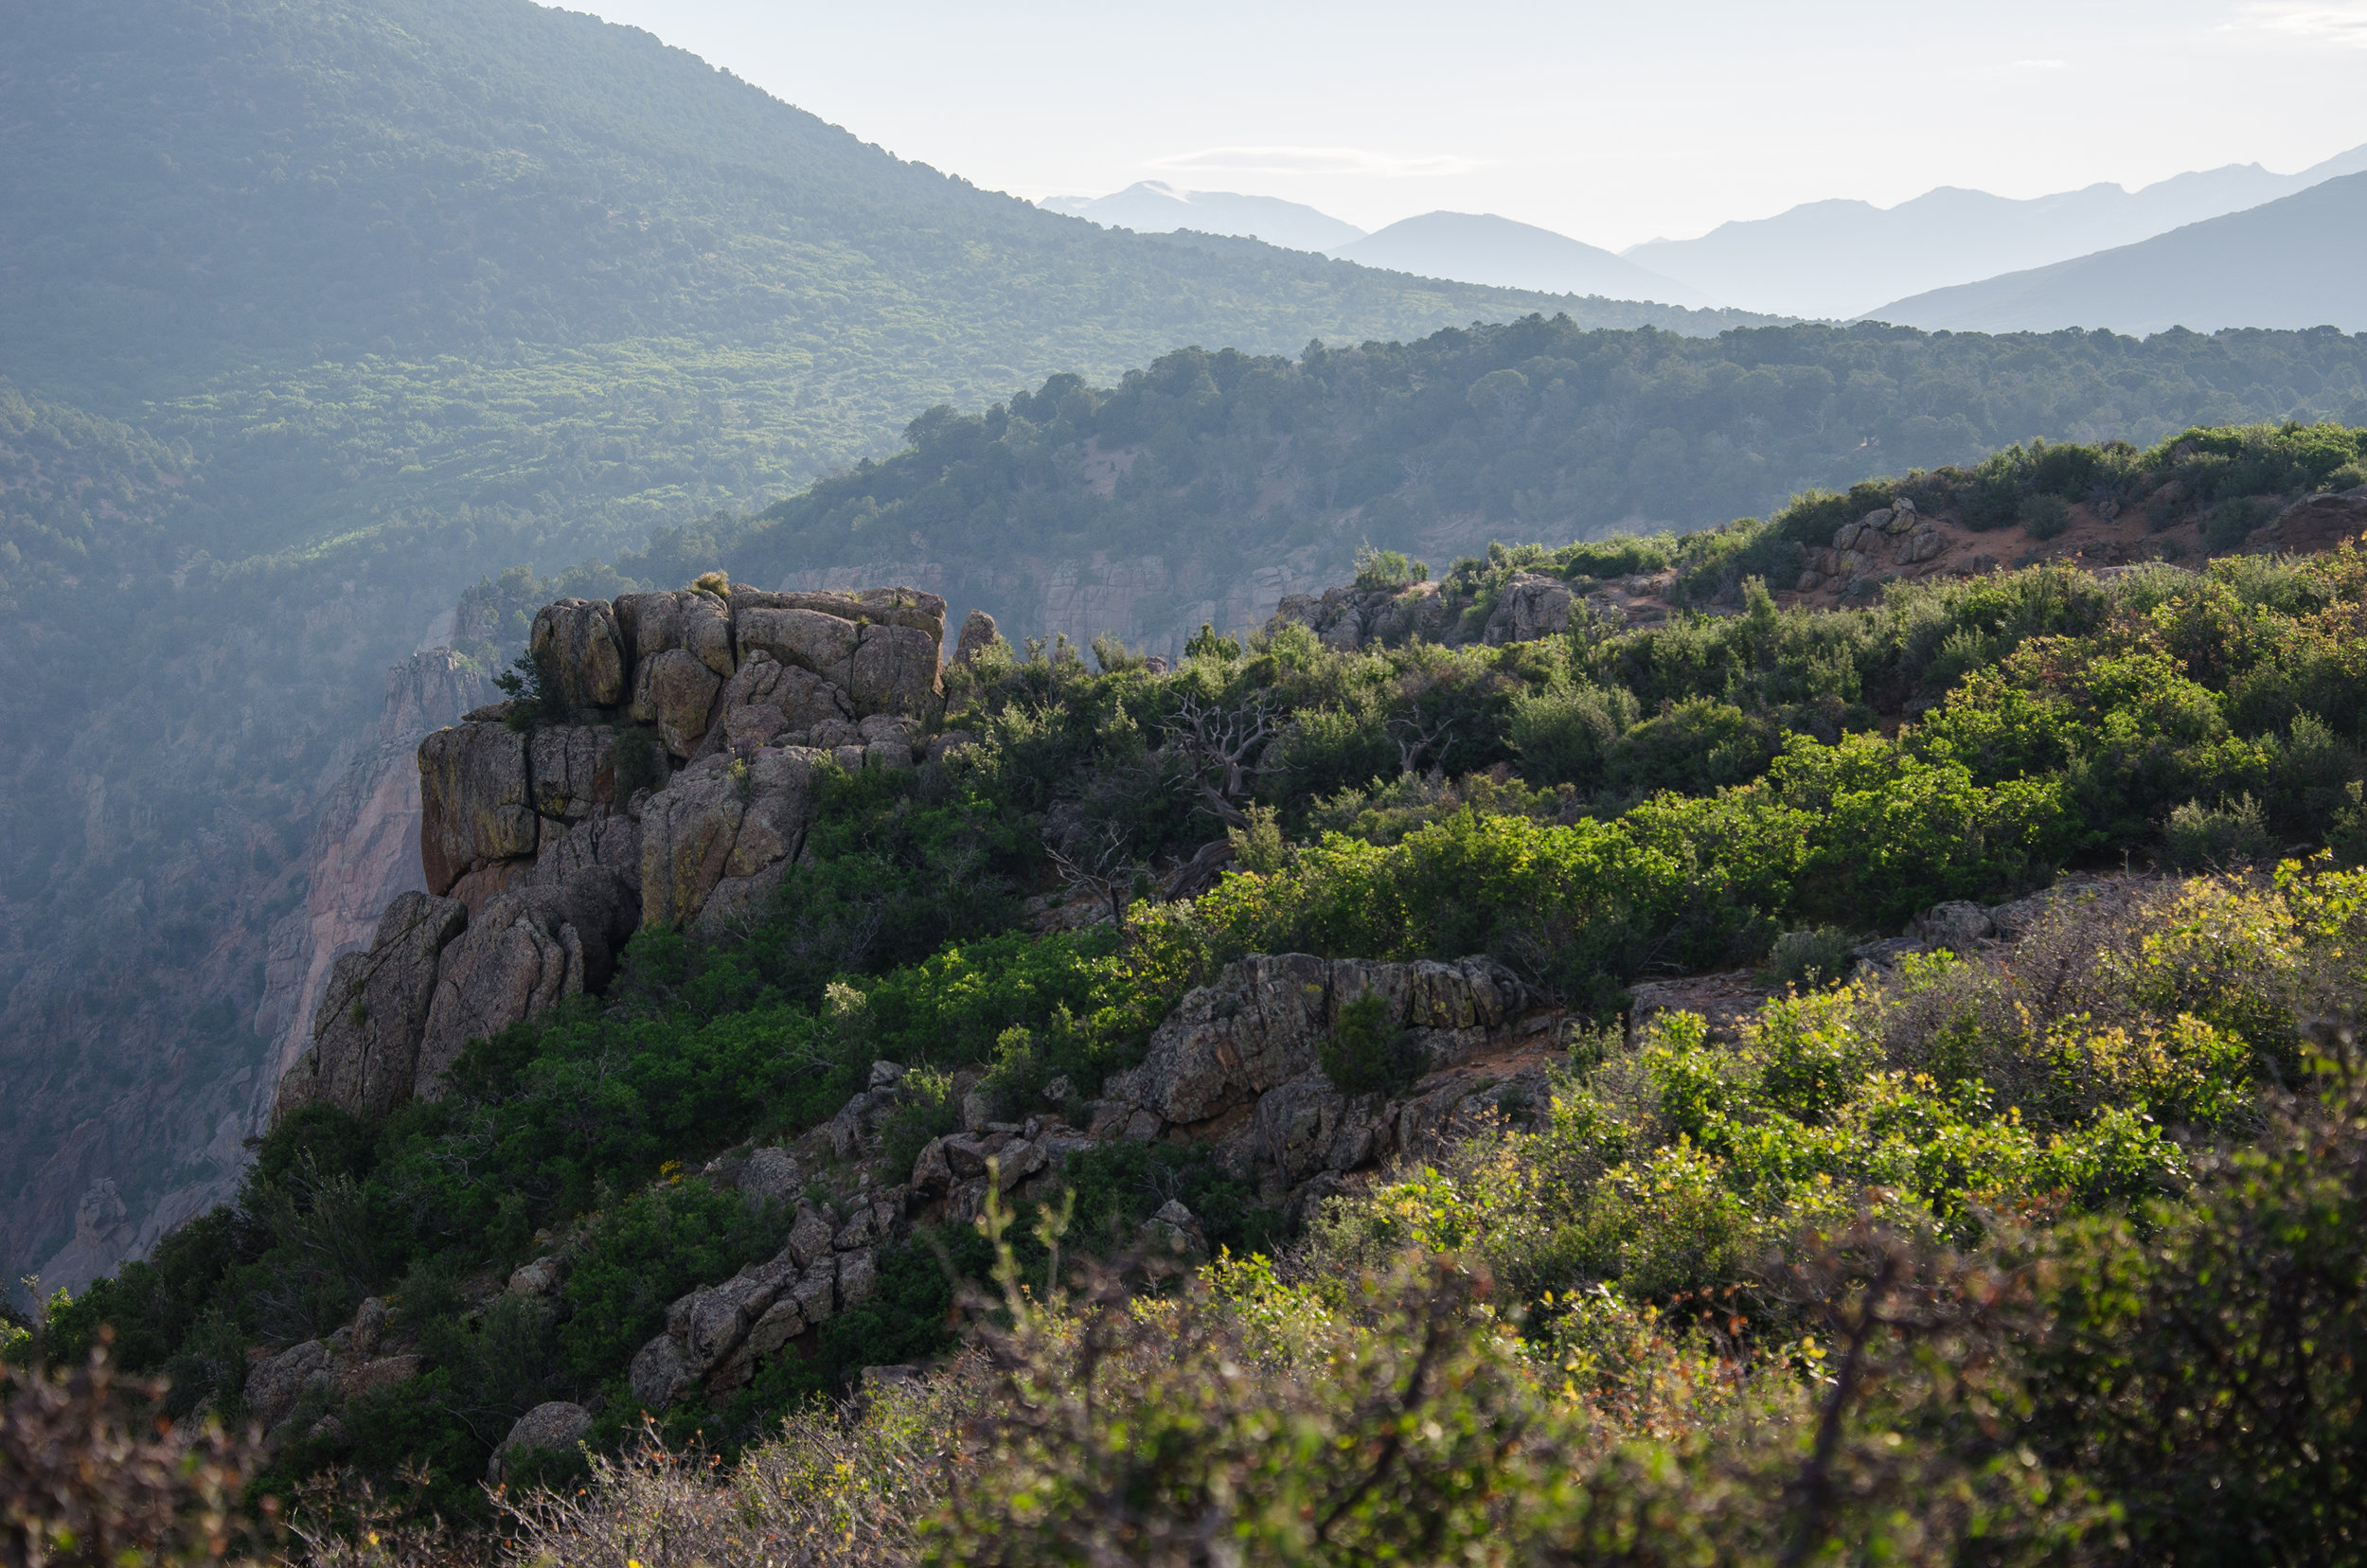 Heather Davis Wyancko Photography, Black Canyon of the Gunnison